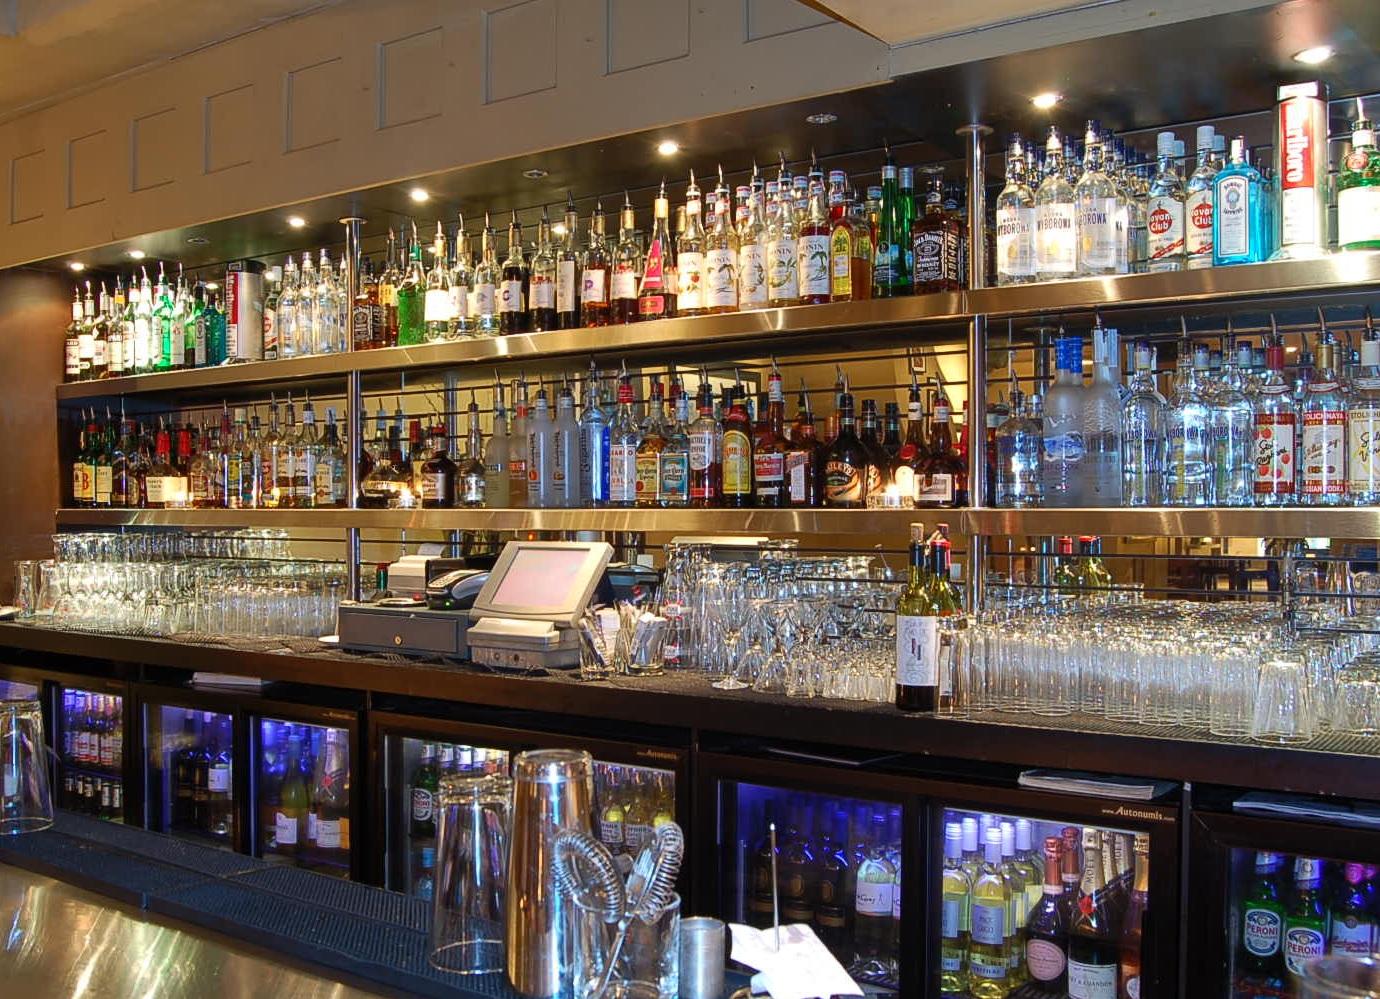 Ad Lib Bar, Chelsea, 2002 - 2006